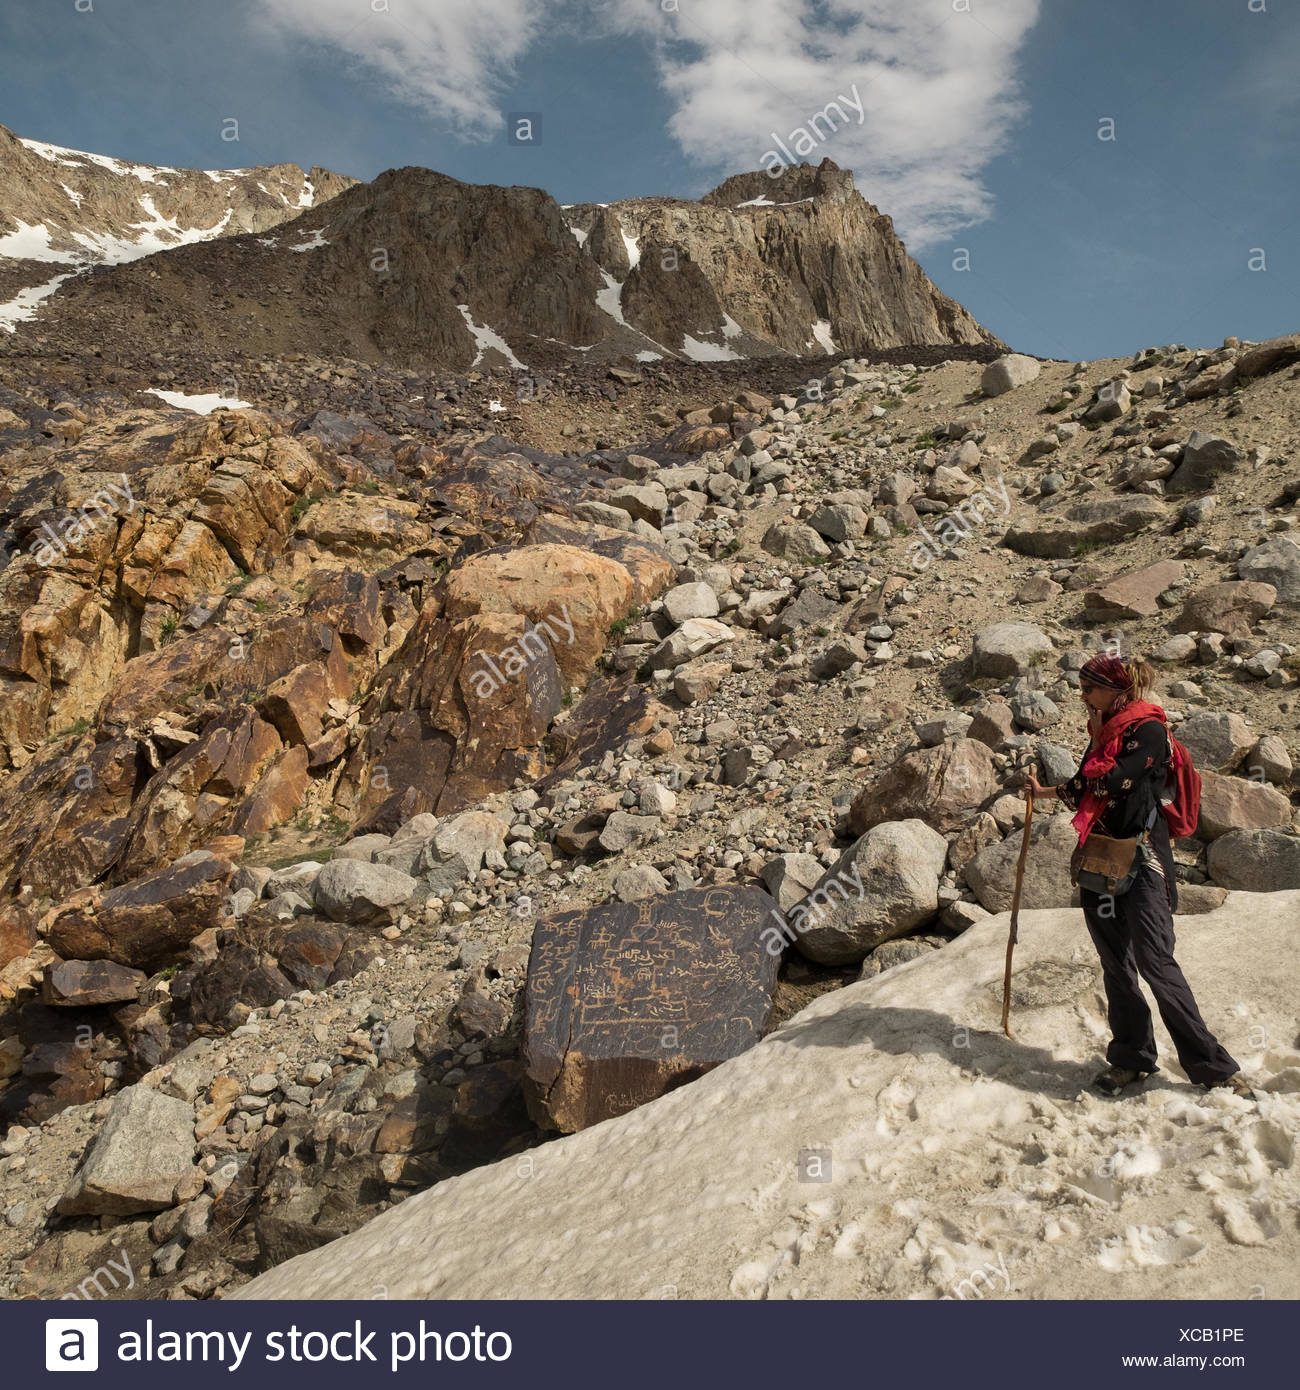 A European woman looks at Tibetan hieroglyph on a high mountain pass. - Stock Image